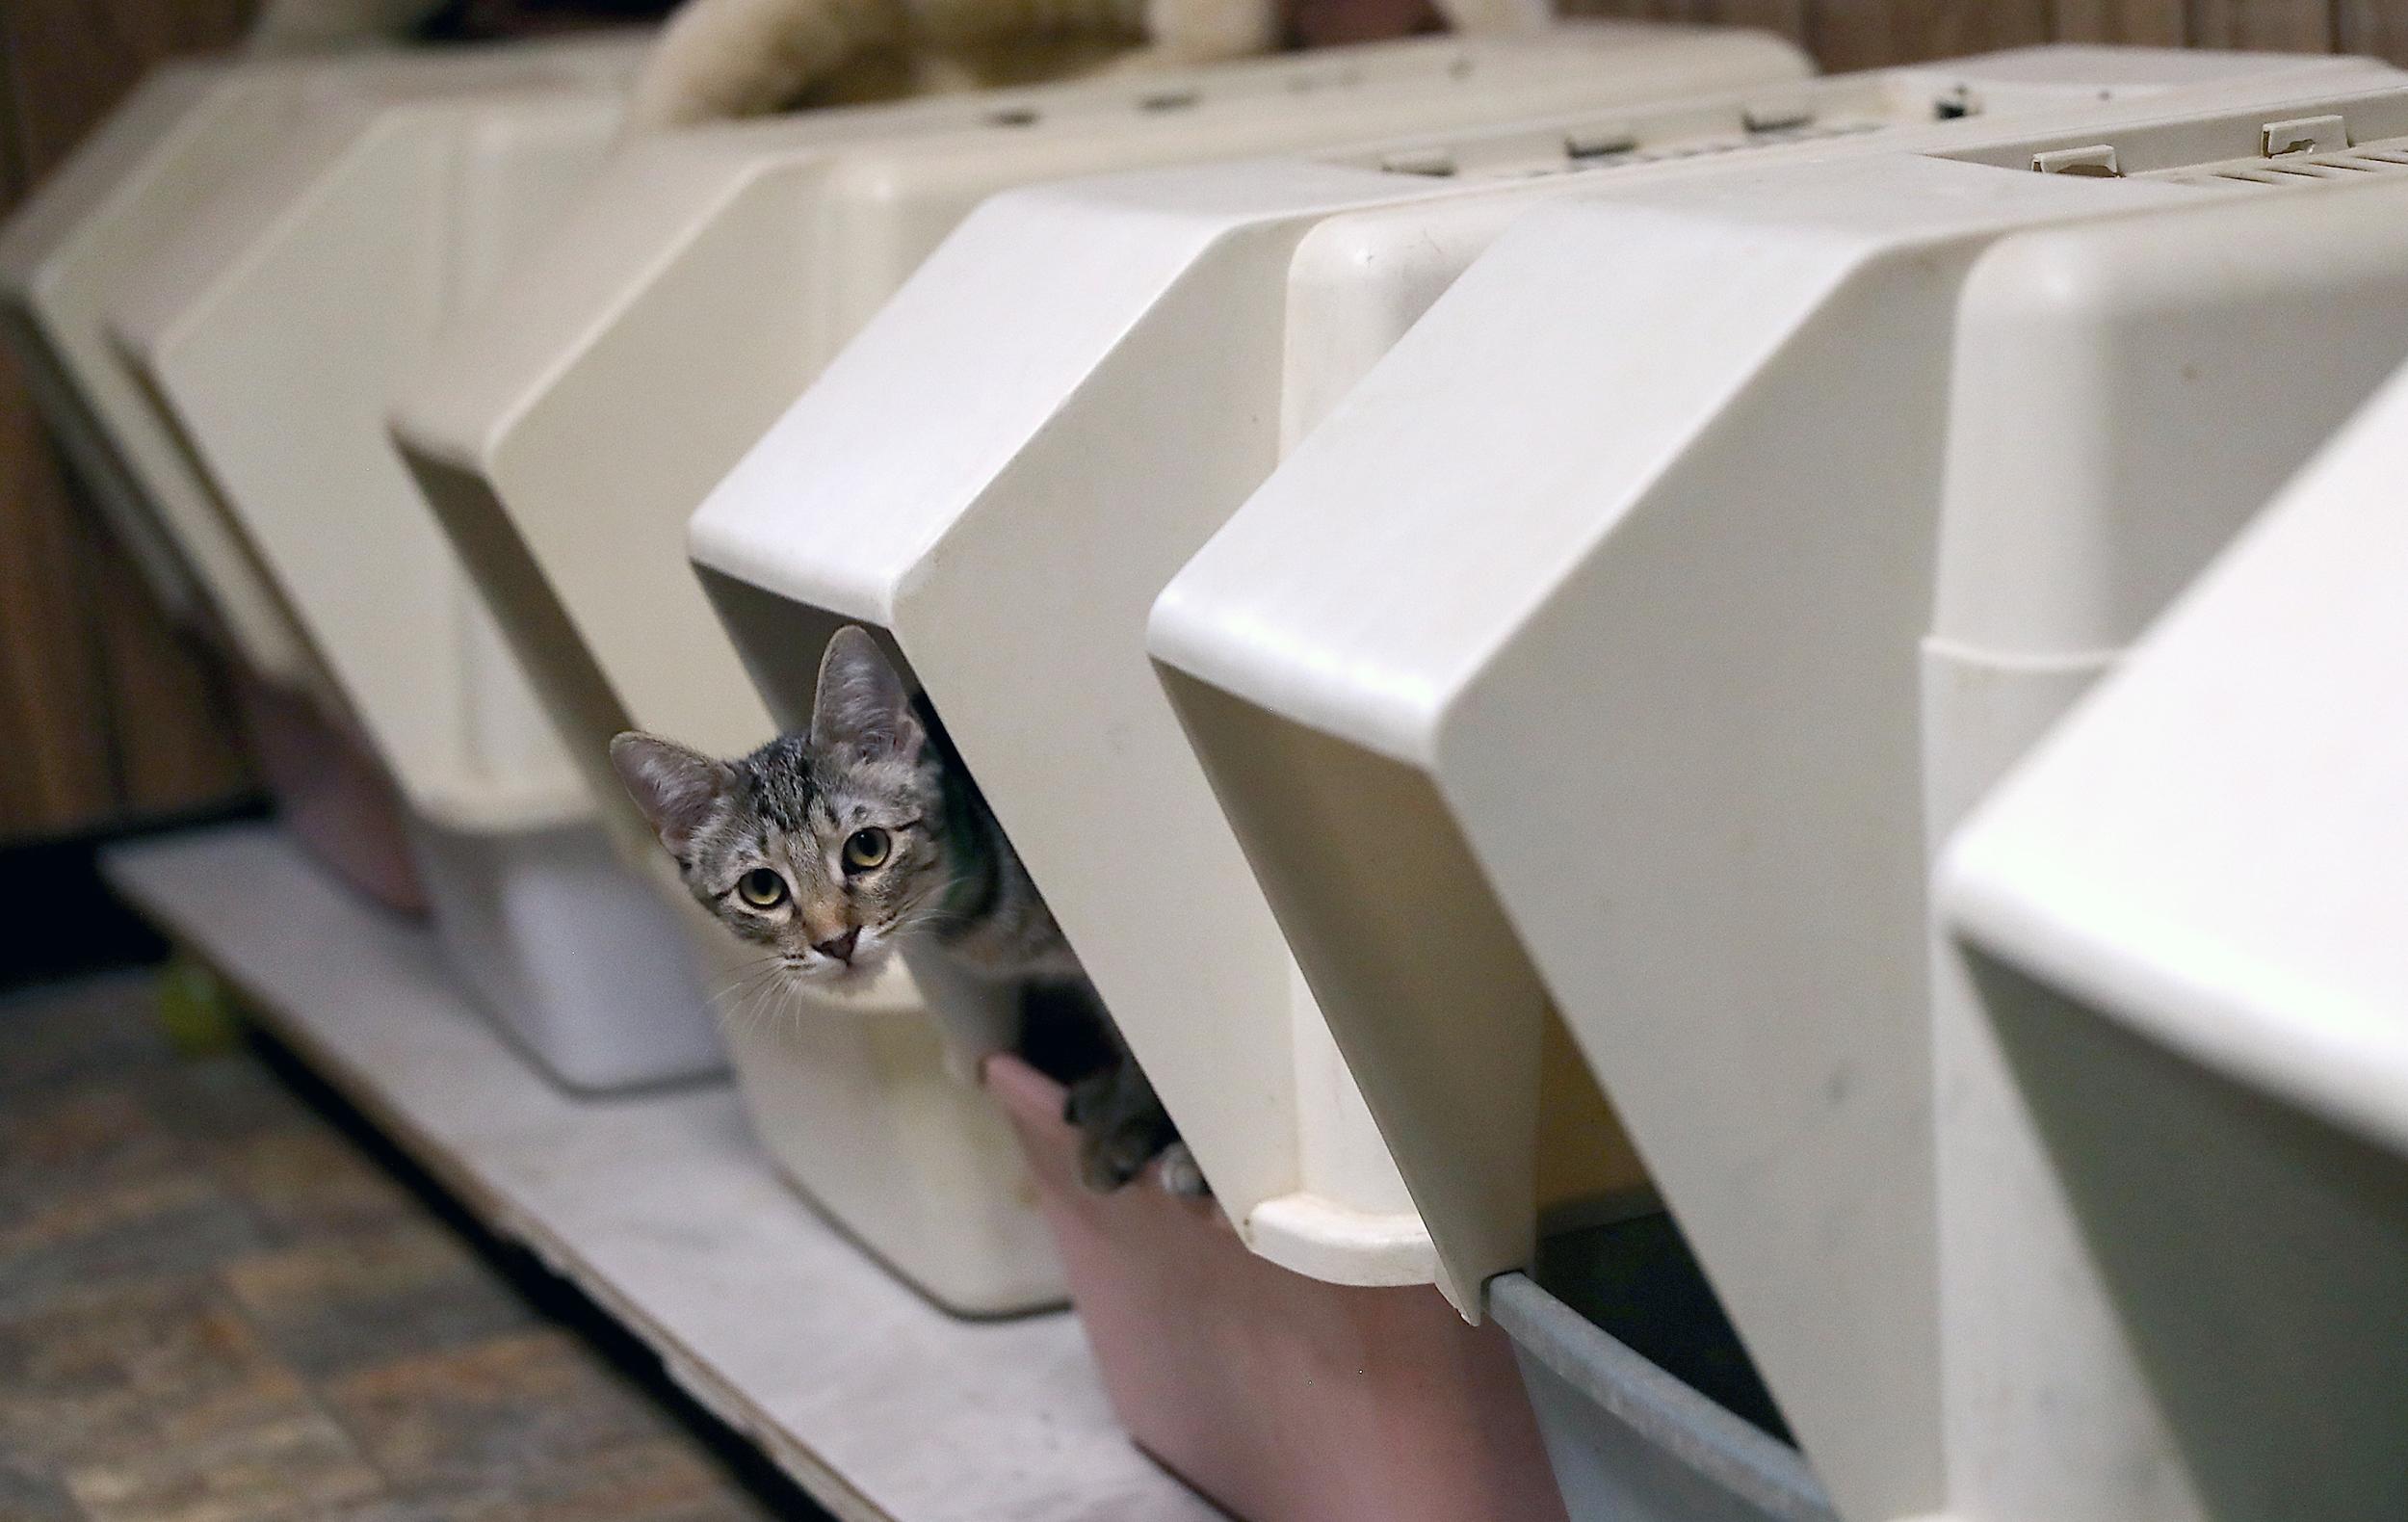 Parasite in cat poop could make us take risks